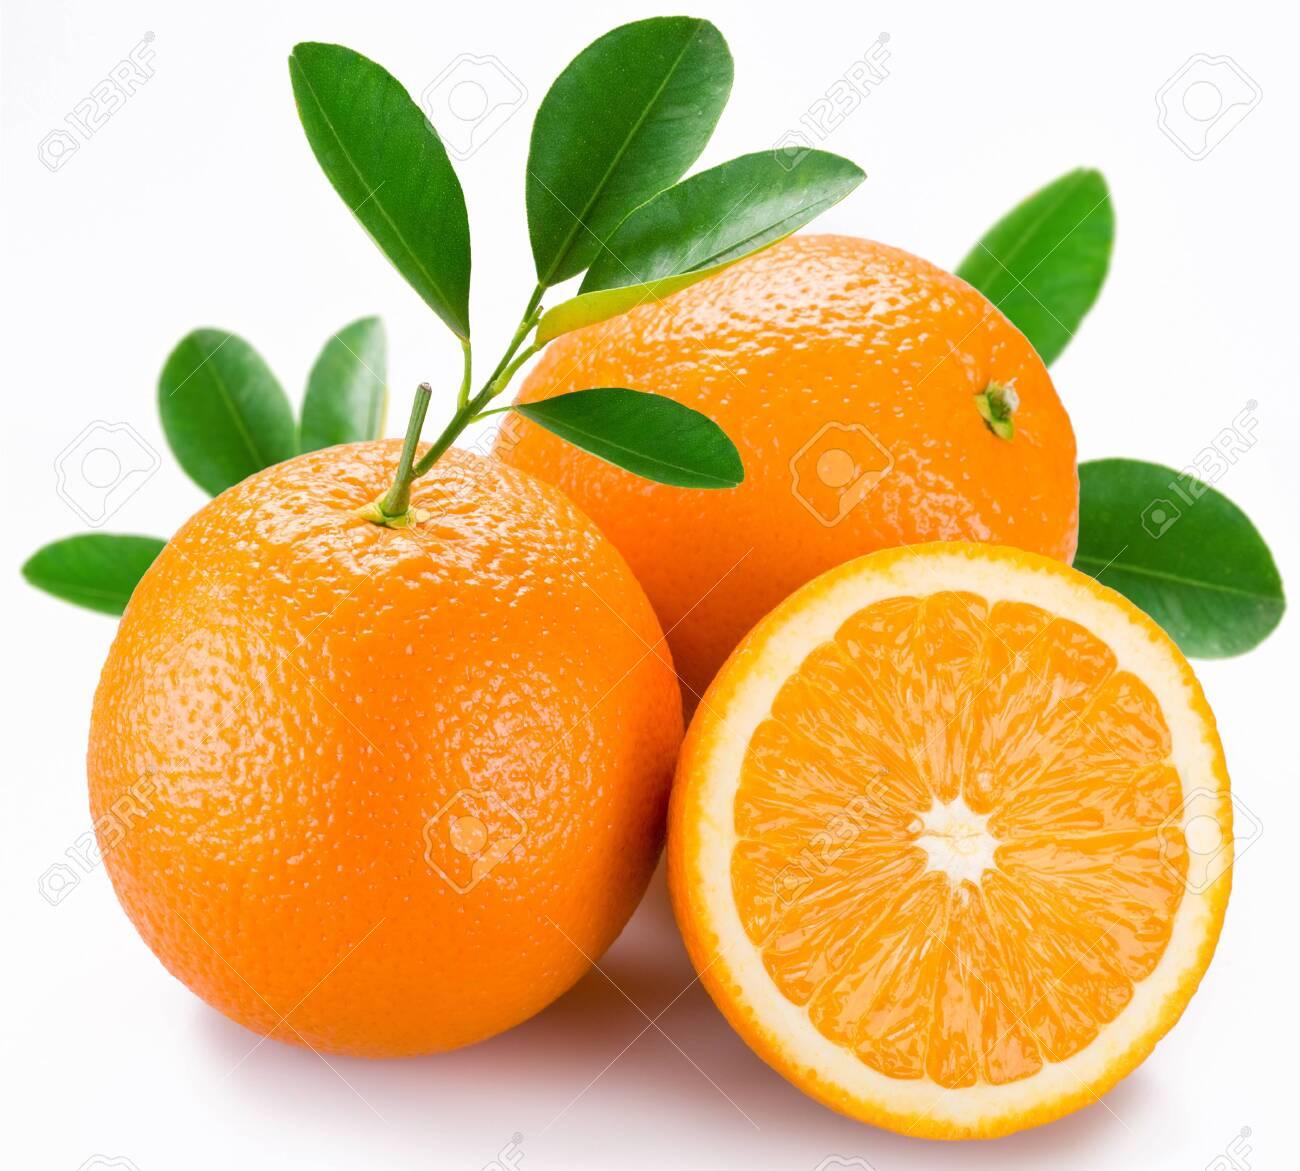 Oranges fruit citrus half sprig leaves white background . - 130679622